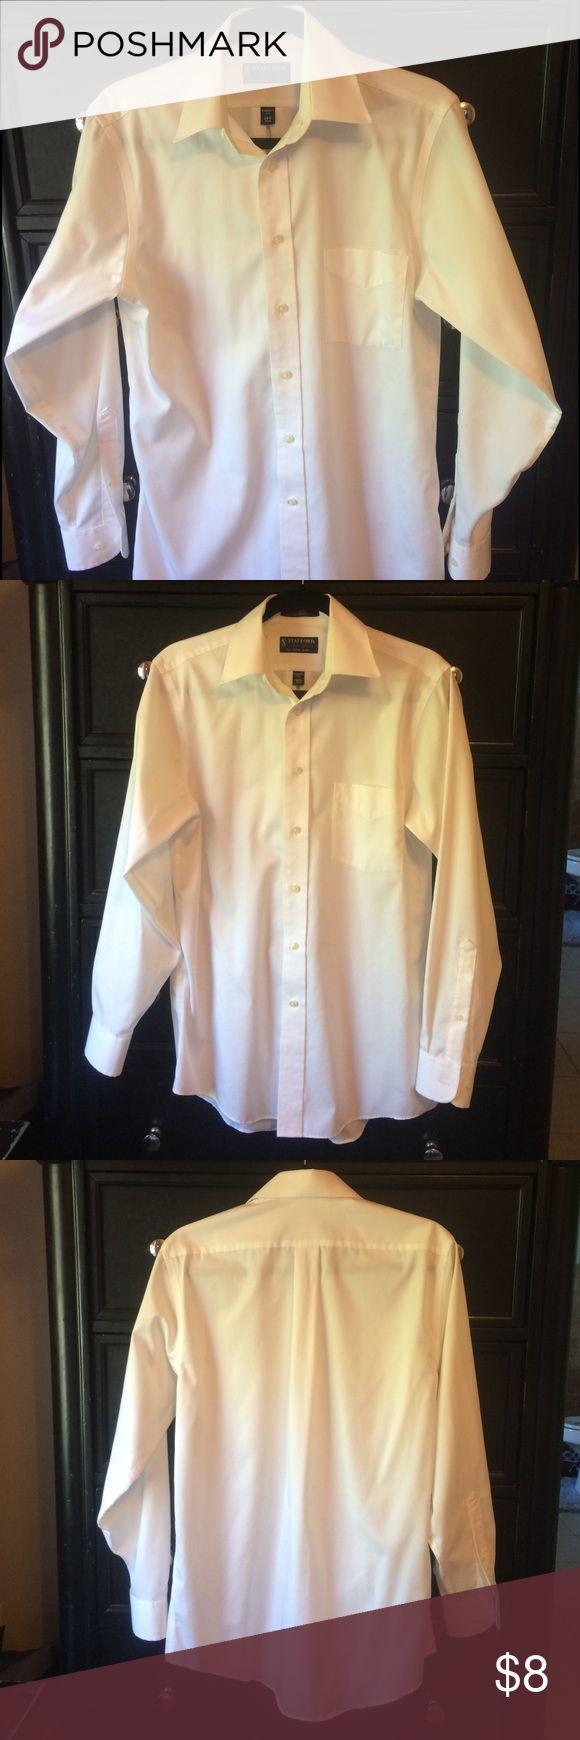 Men's white dress shirt, classic fit 14.5, 32-33 Men's white dress shirt, classic fit 14.5, 32-33. Slight yellowing around collar. stafford Shirts Dress Shirts